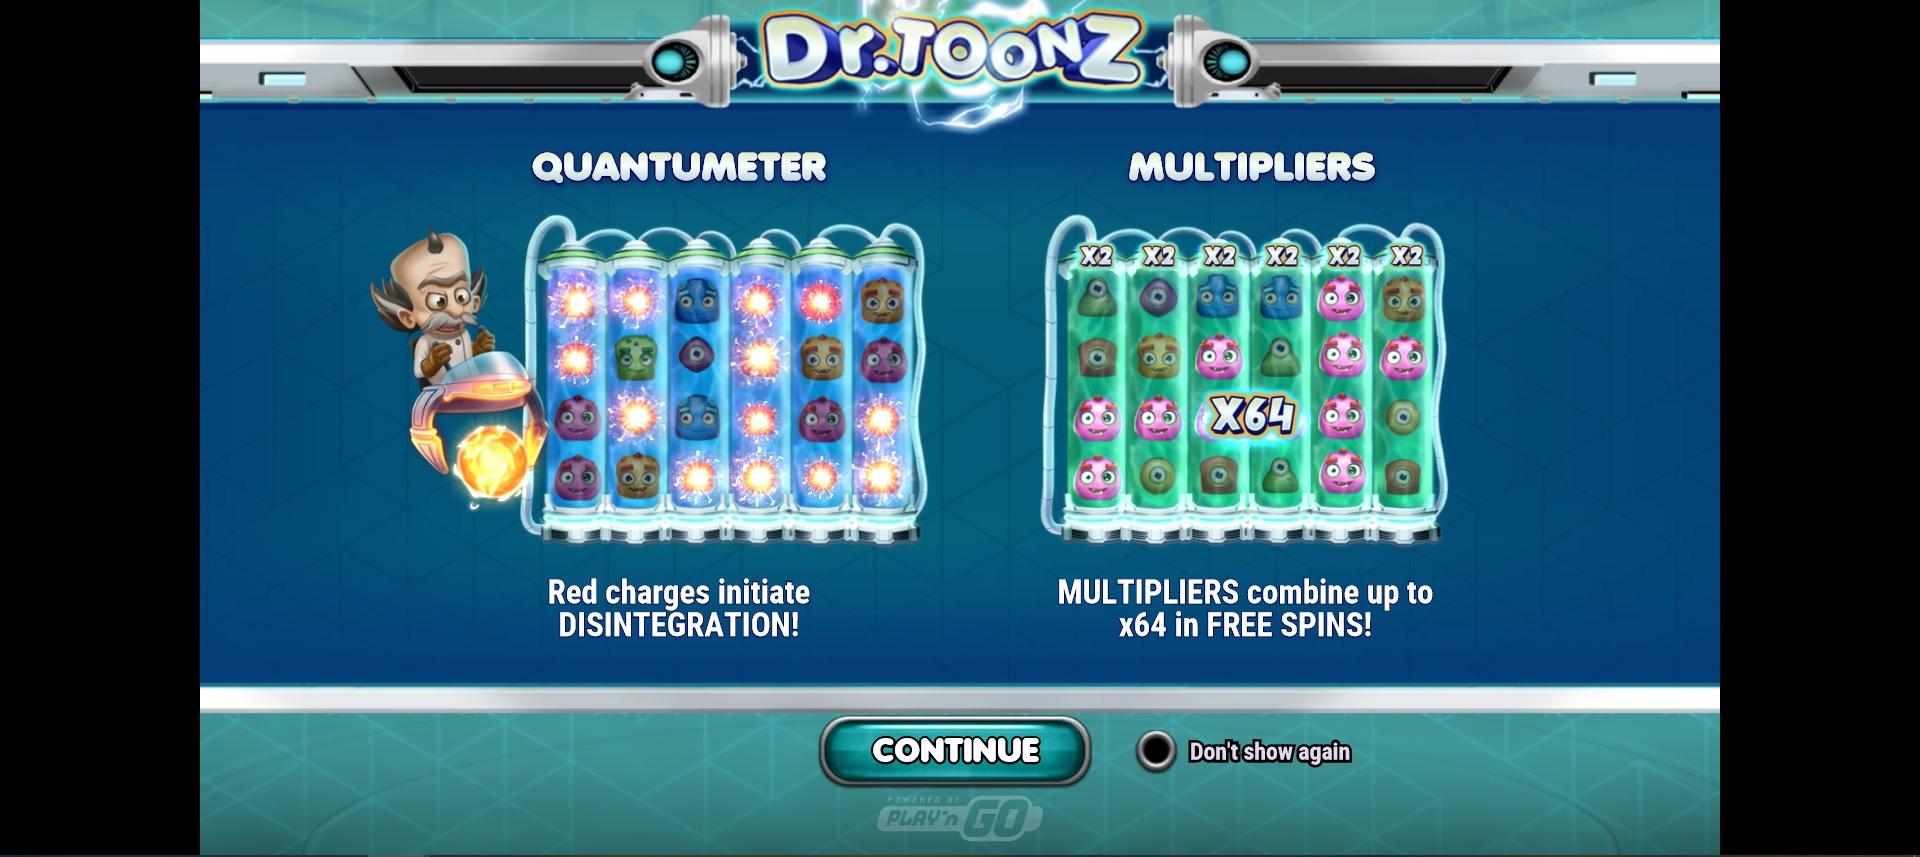 How to win big in Dr. Toonz – Quantumeter features